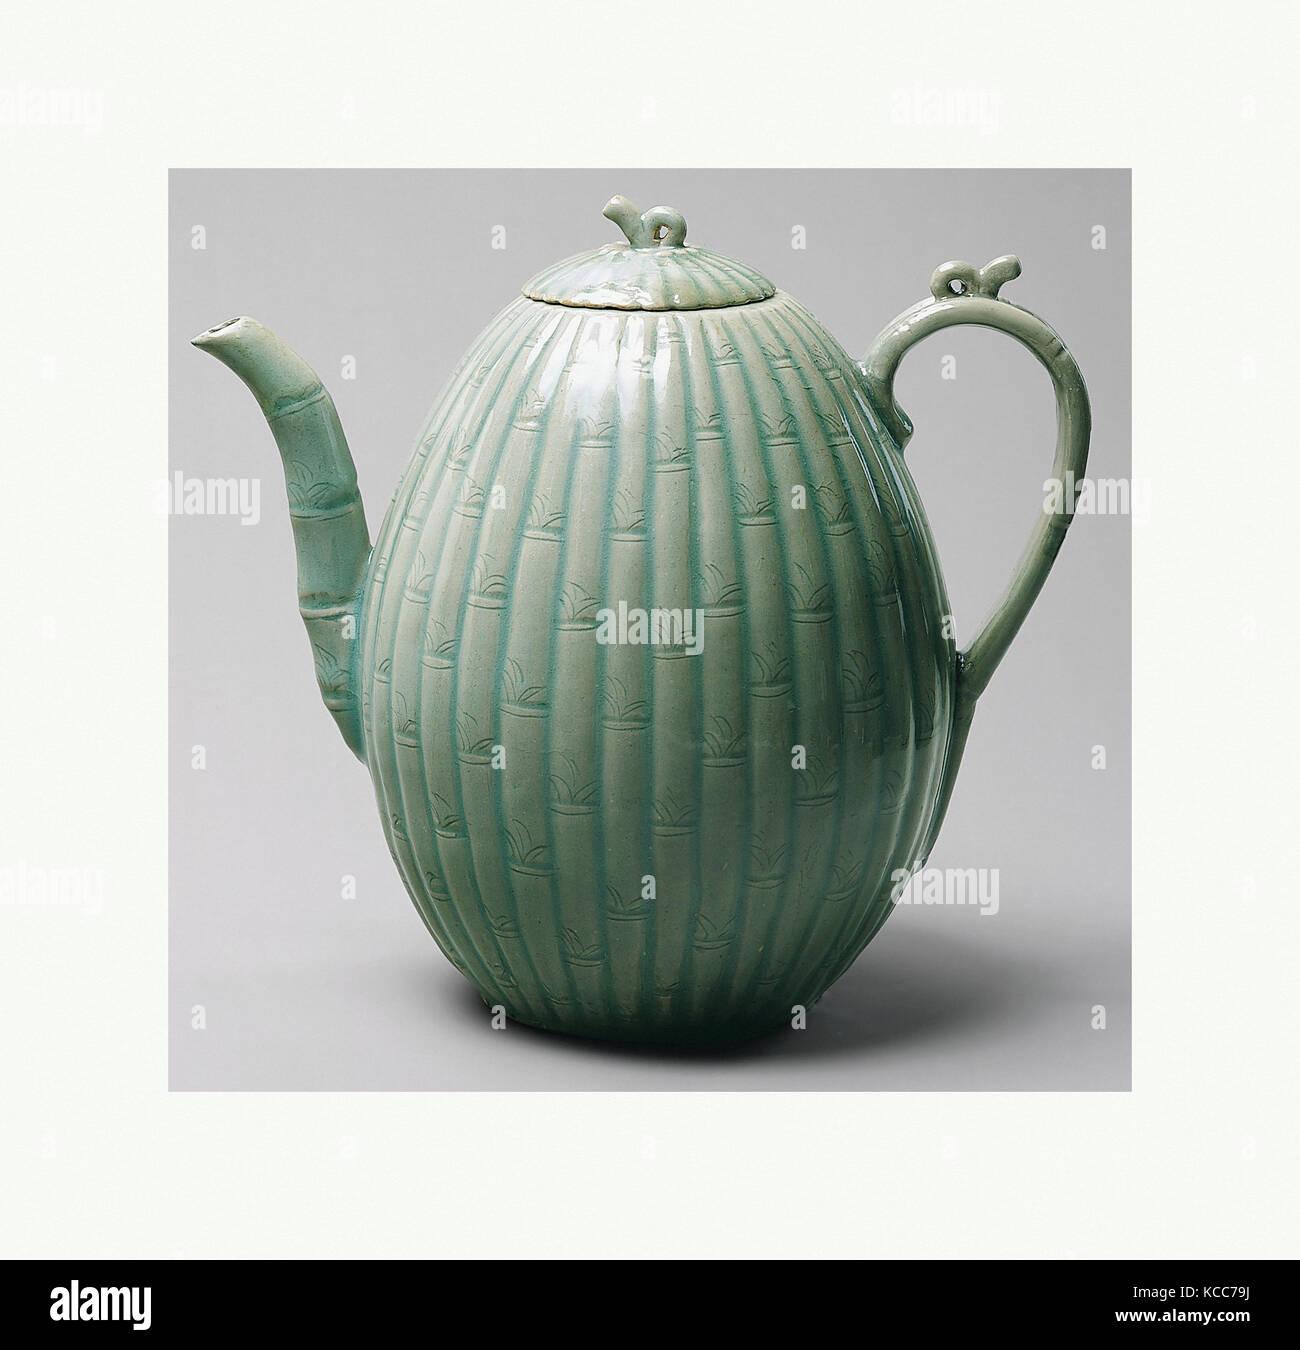 Melone Formige Ewer Mit Bambus Dekoration 청자 양각 대나무 마디